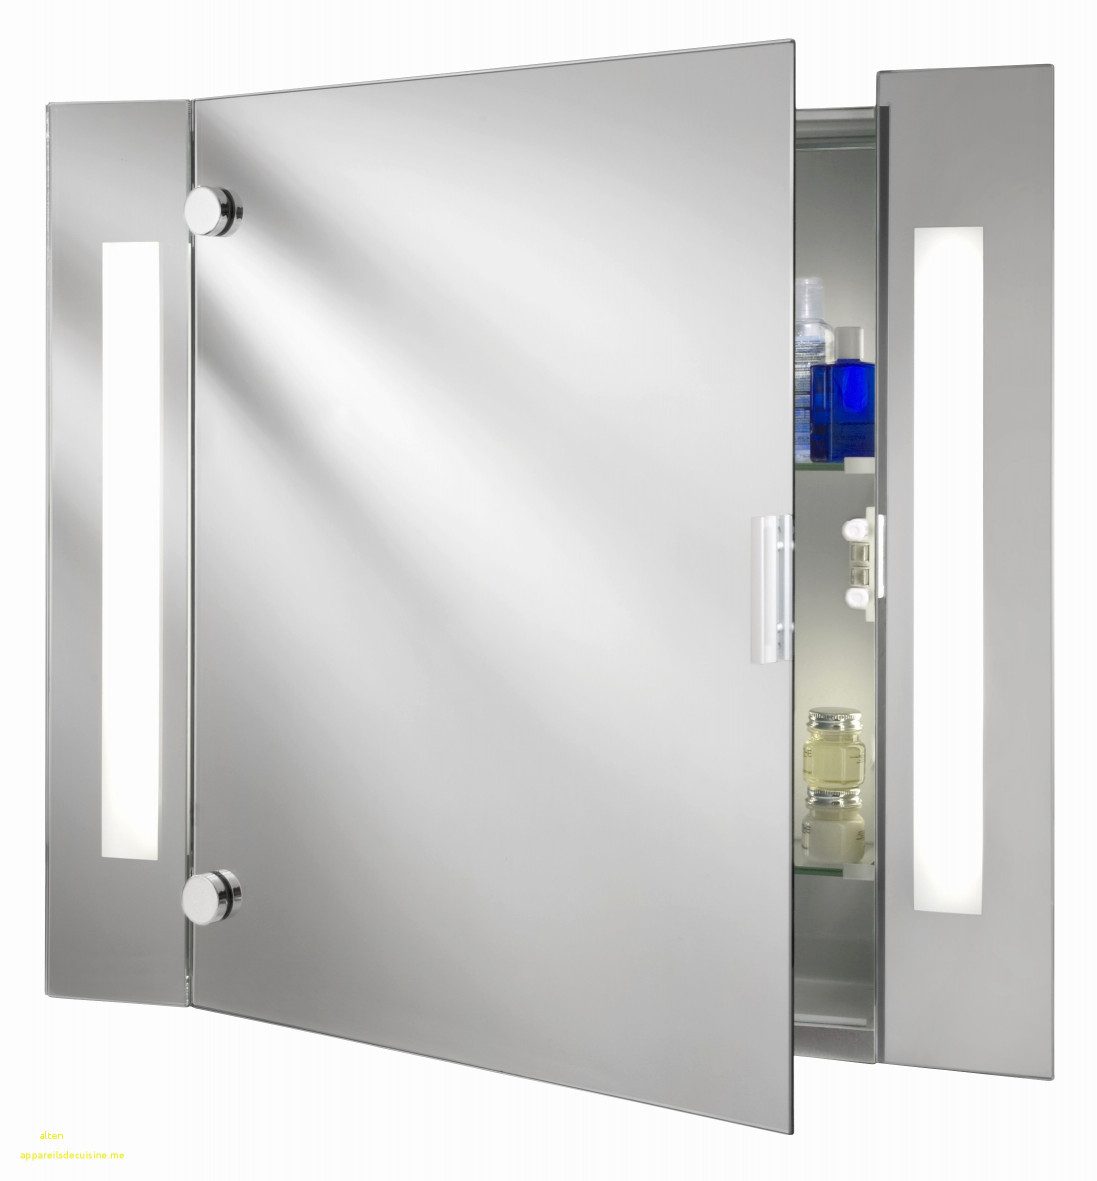 Ikea Miroir Salle De Bain Unique Stock Ikea Miroir Salle De Bain Superbe Résultat Supérieur Miroir Armoire